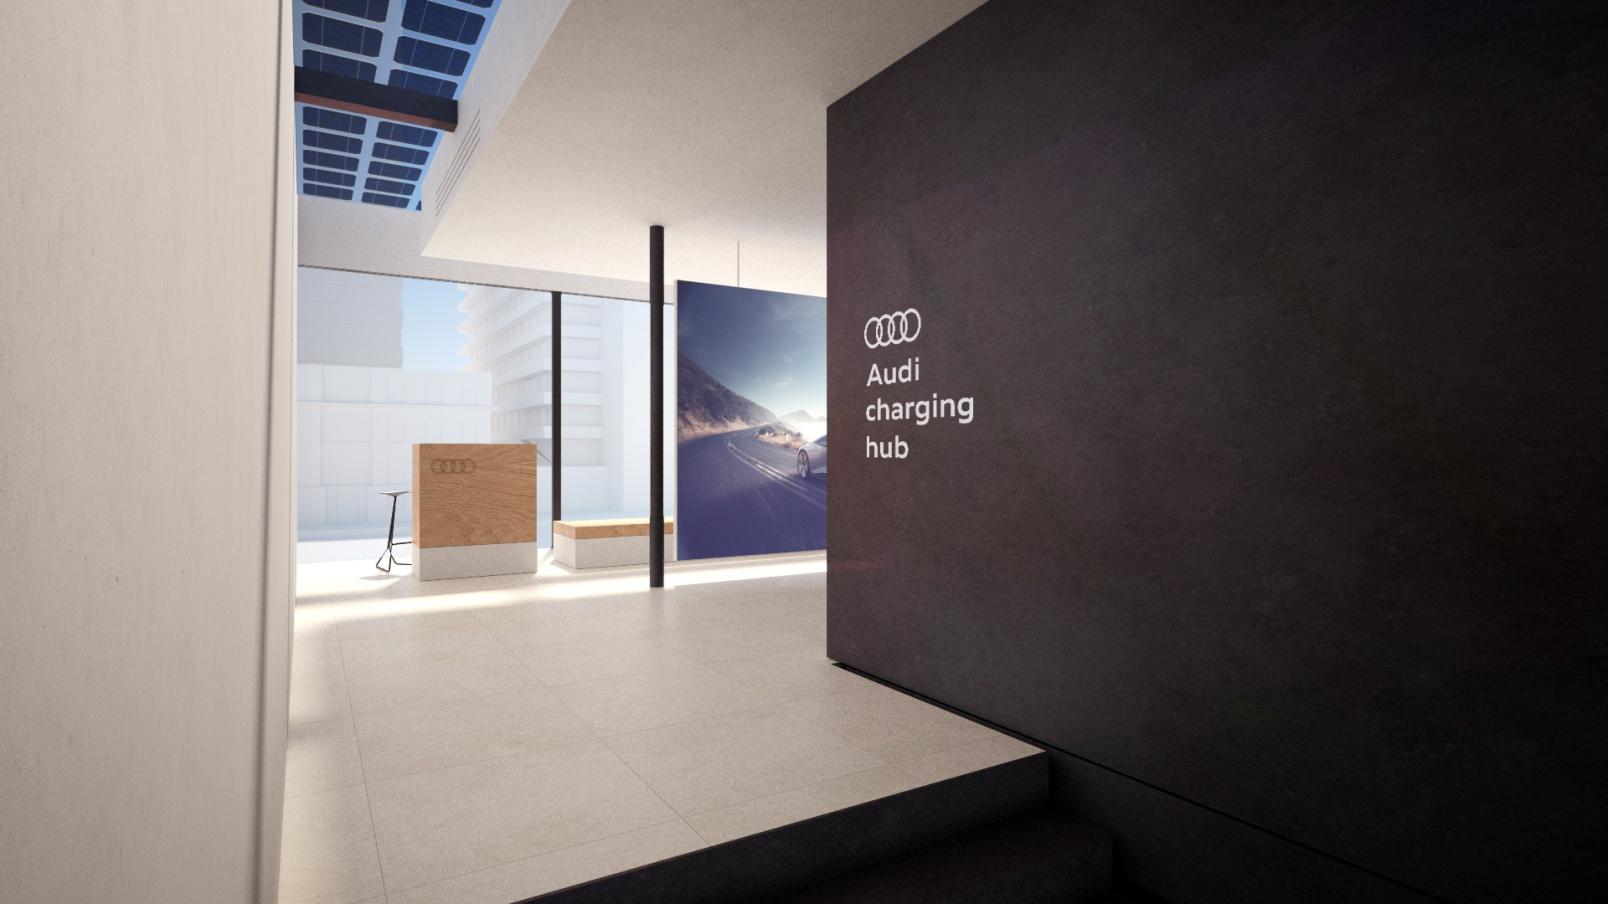 Audi Charging Hub (2)